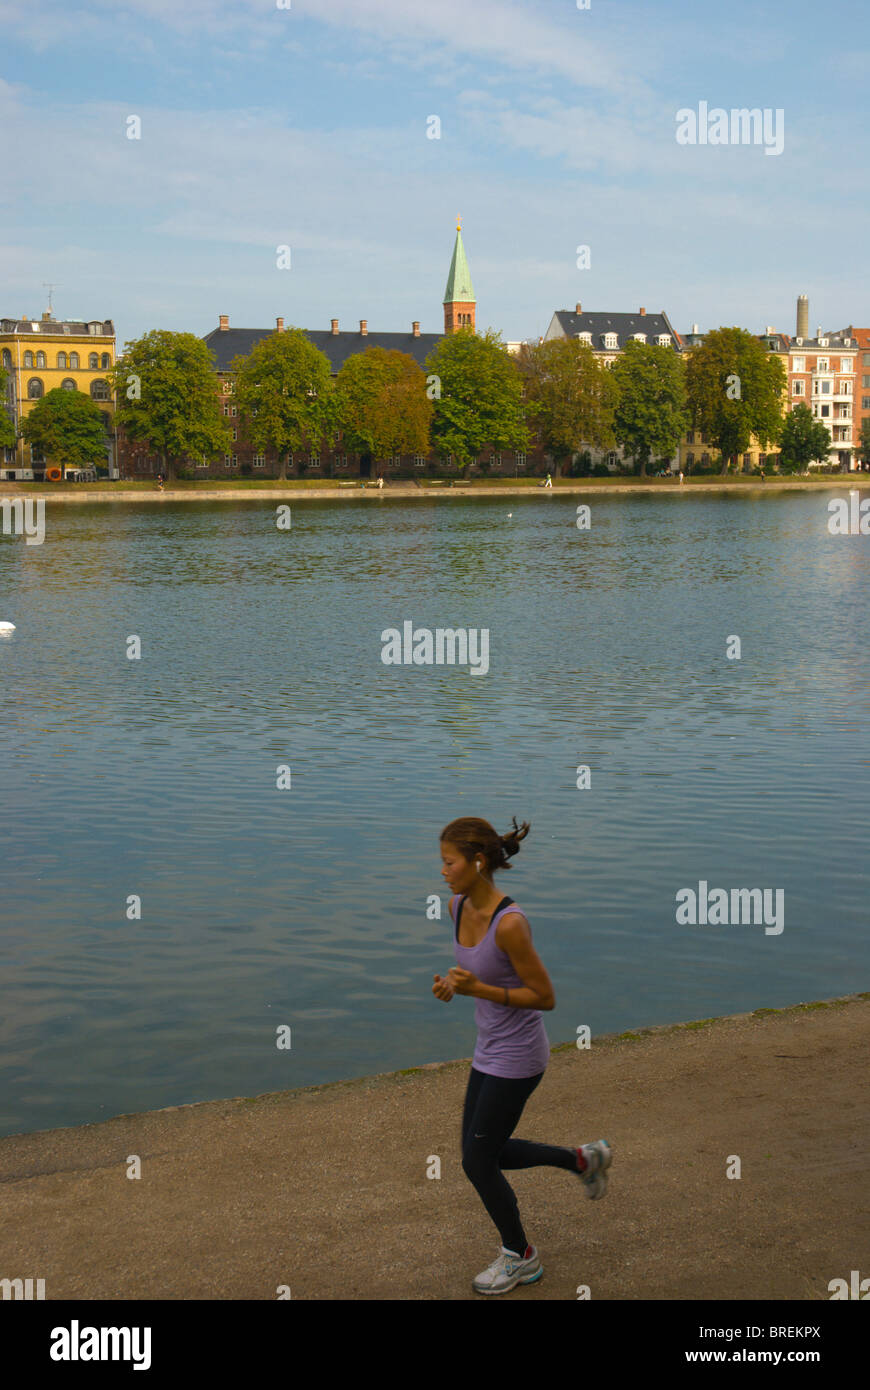 Female jogger along Sortedams So man-made lake central Copenhagen Denmark Europe - Stock Image